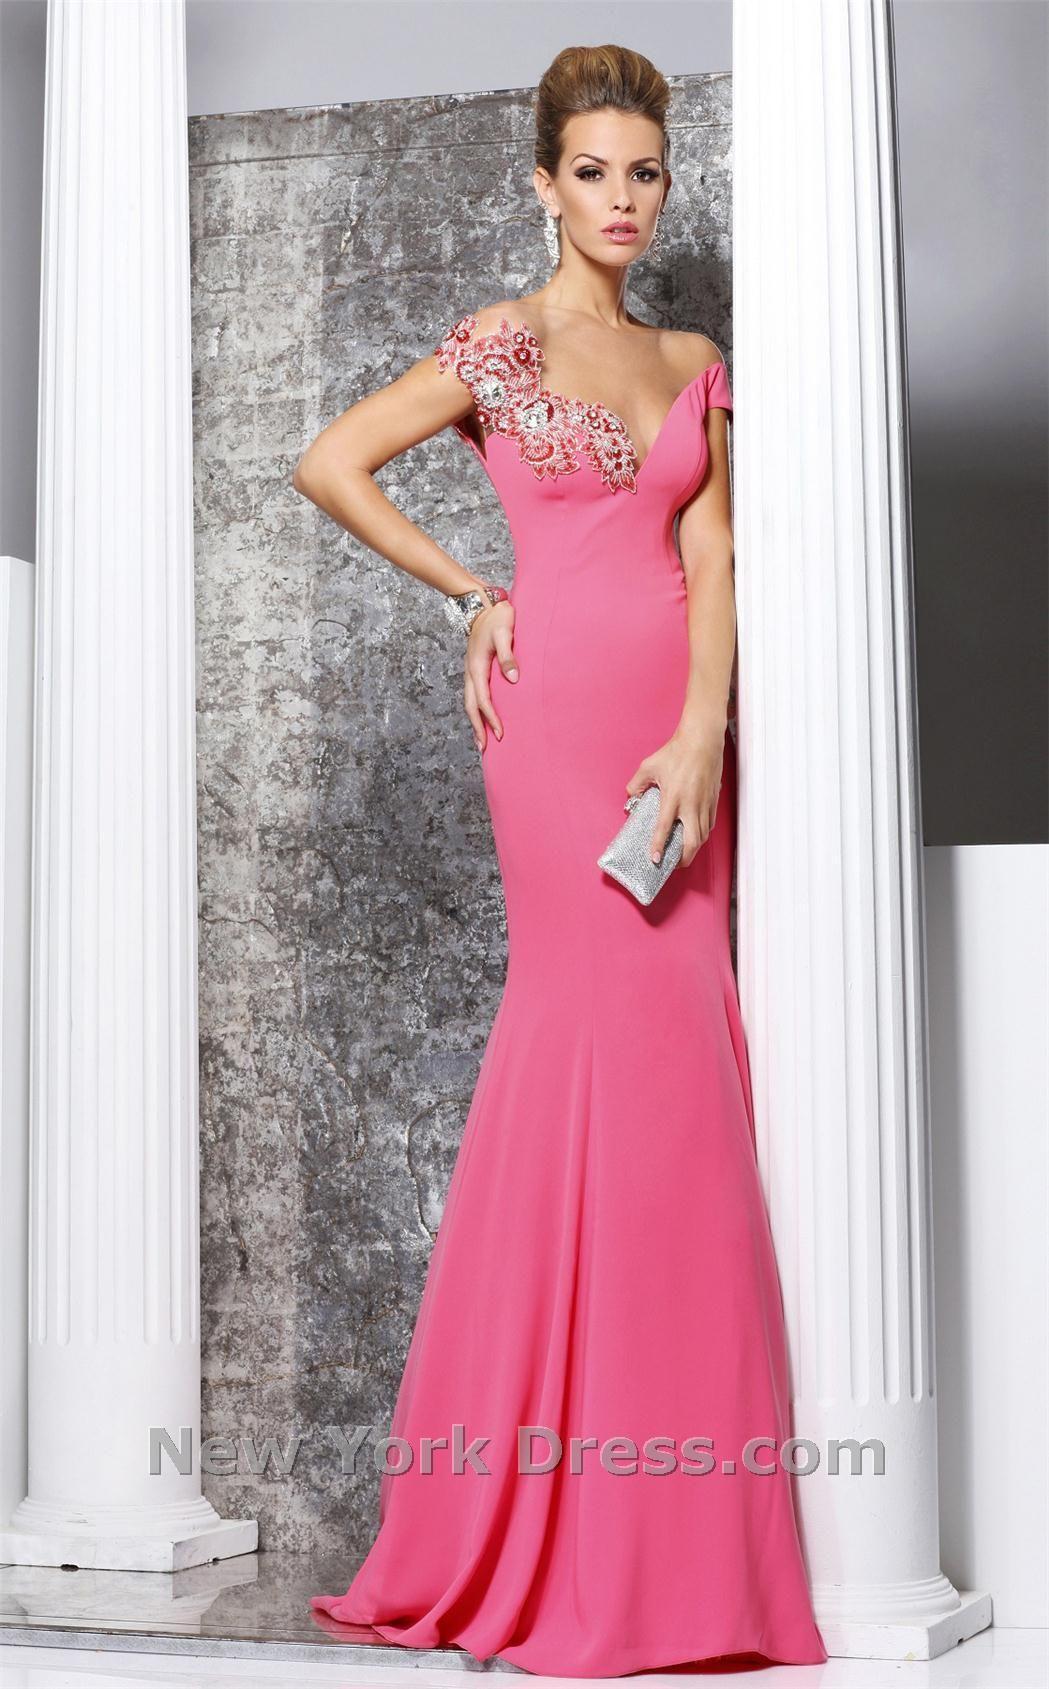 Tarik Ediz 92167 Dress. Shop NewYorkDress at NewYorkDress.com or ...